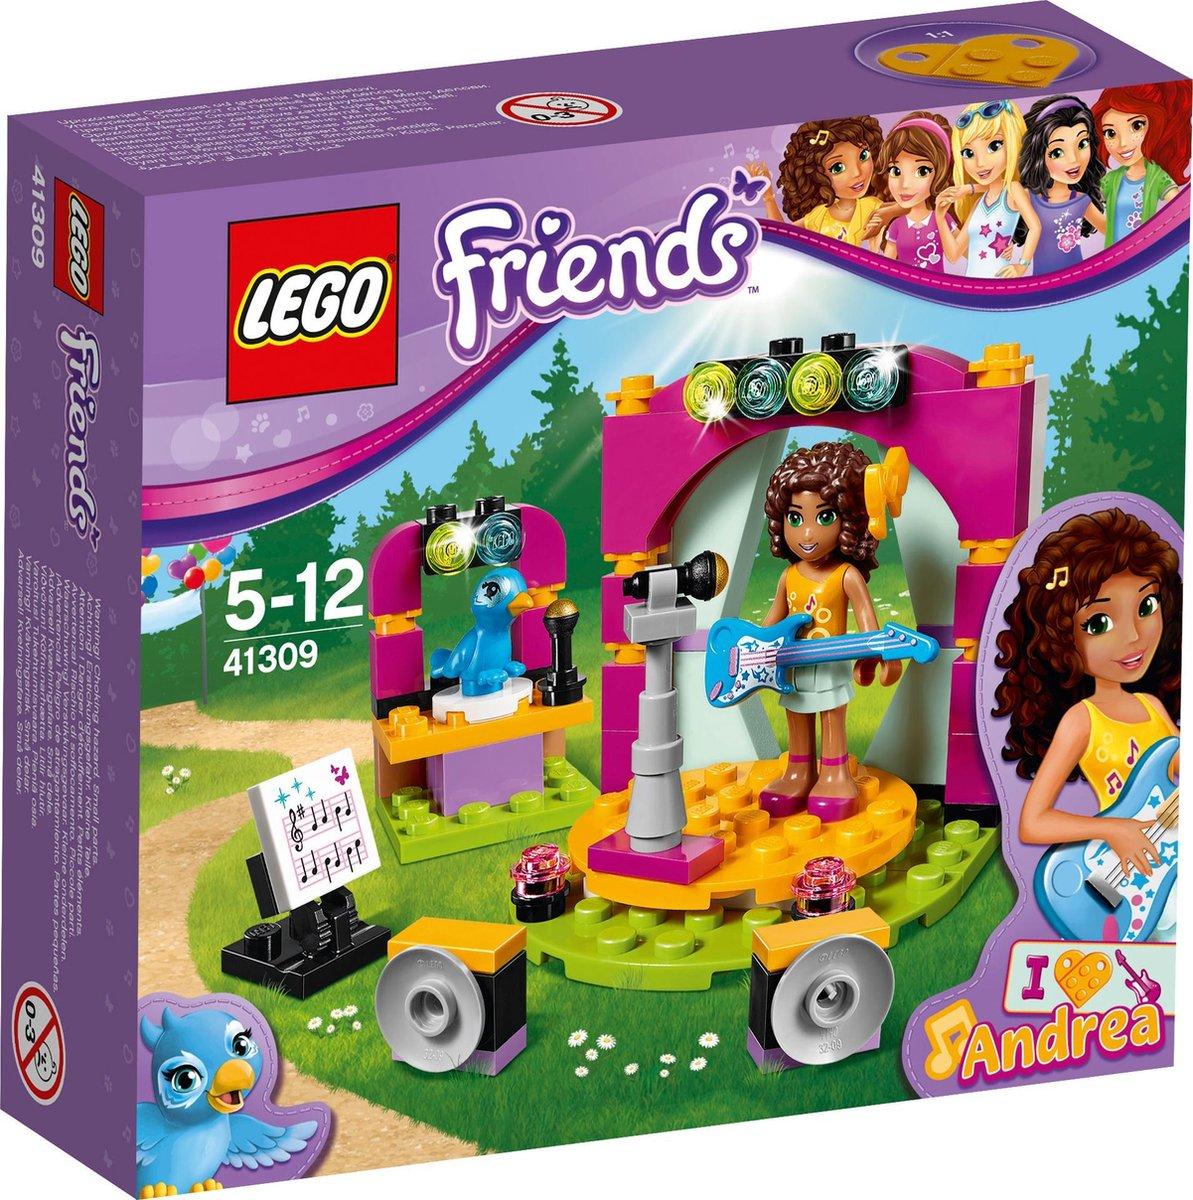 LEGO Friends Andrea